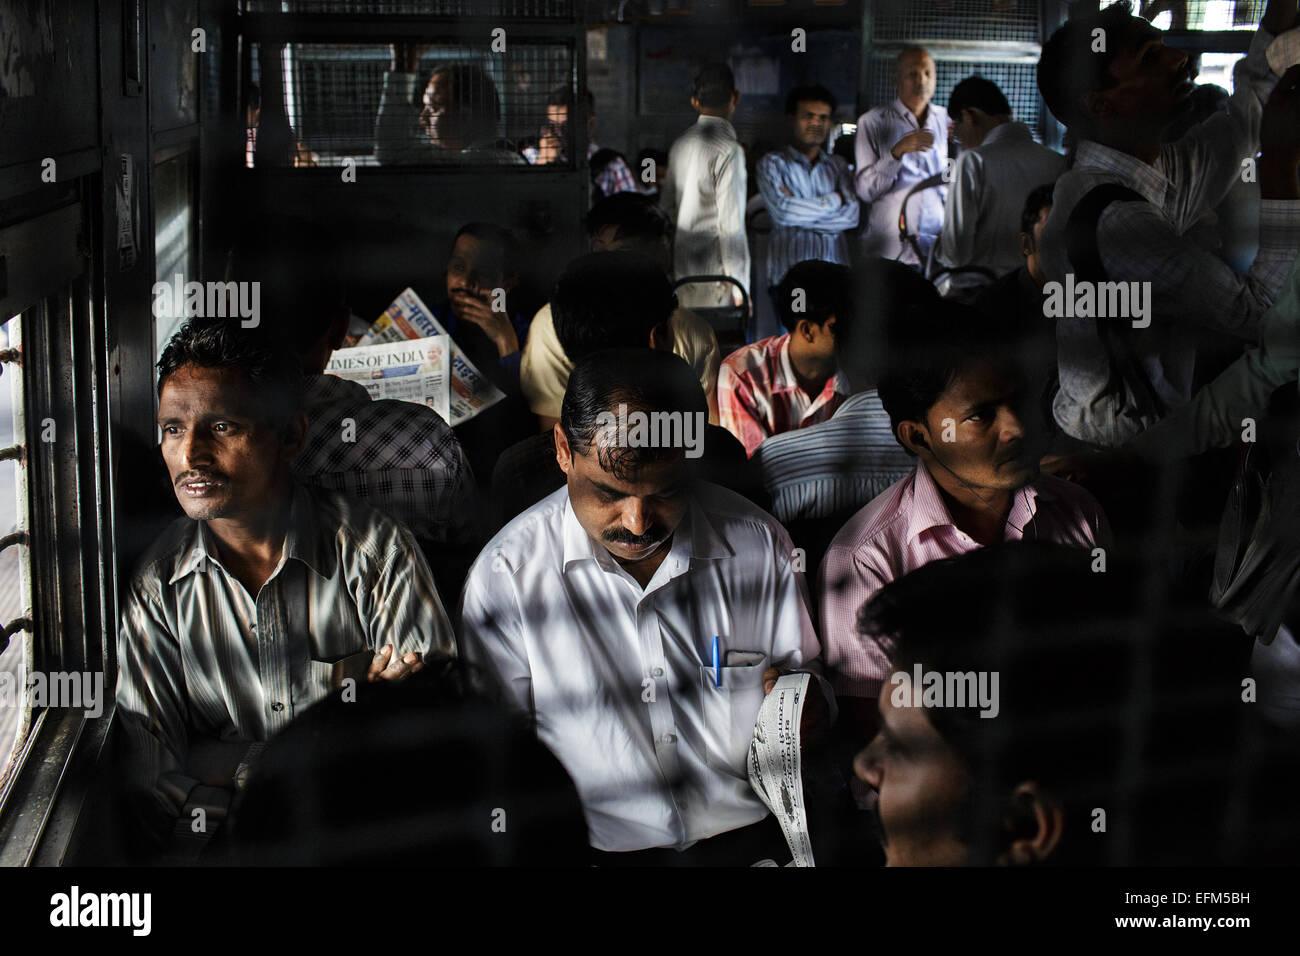 Commuters on a suburban train in Mumbai, India Stock Photo